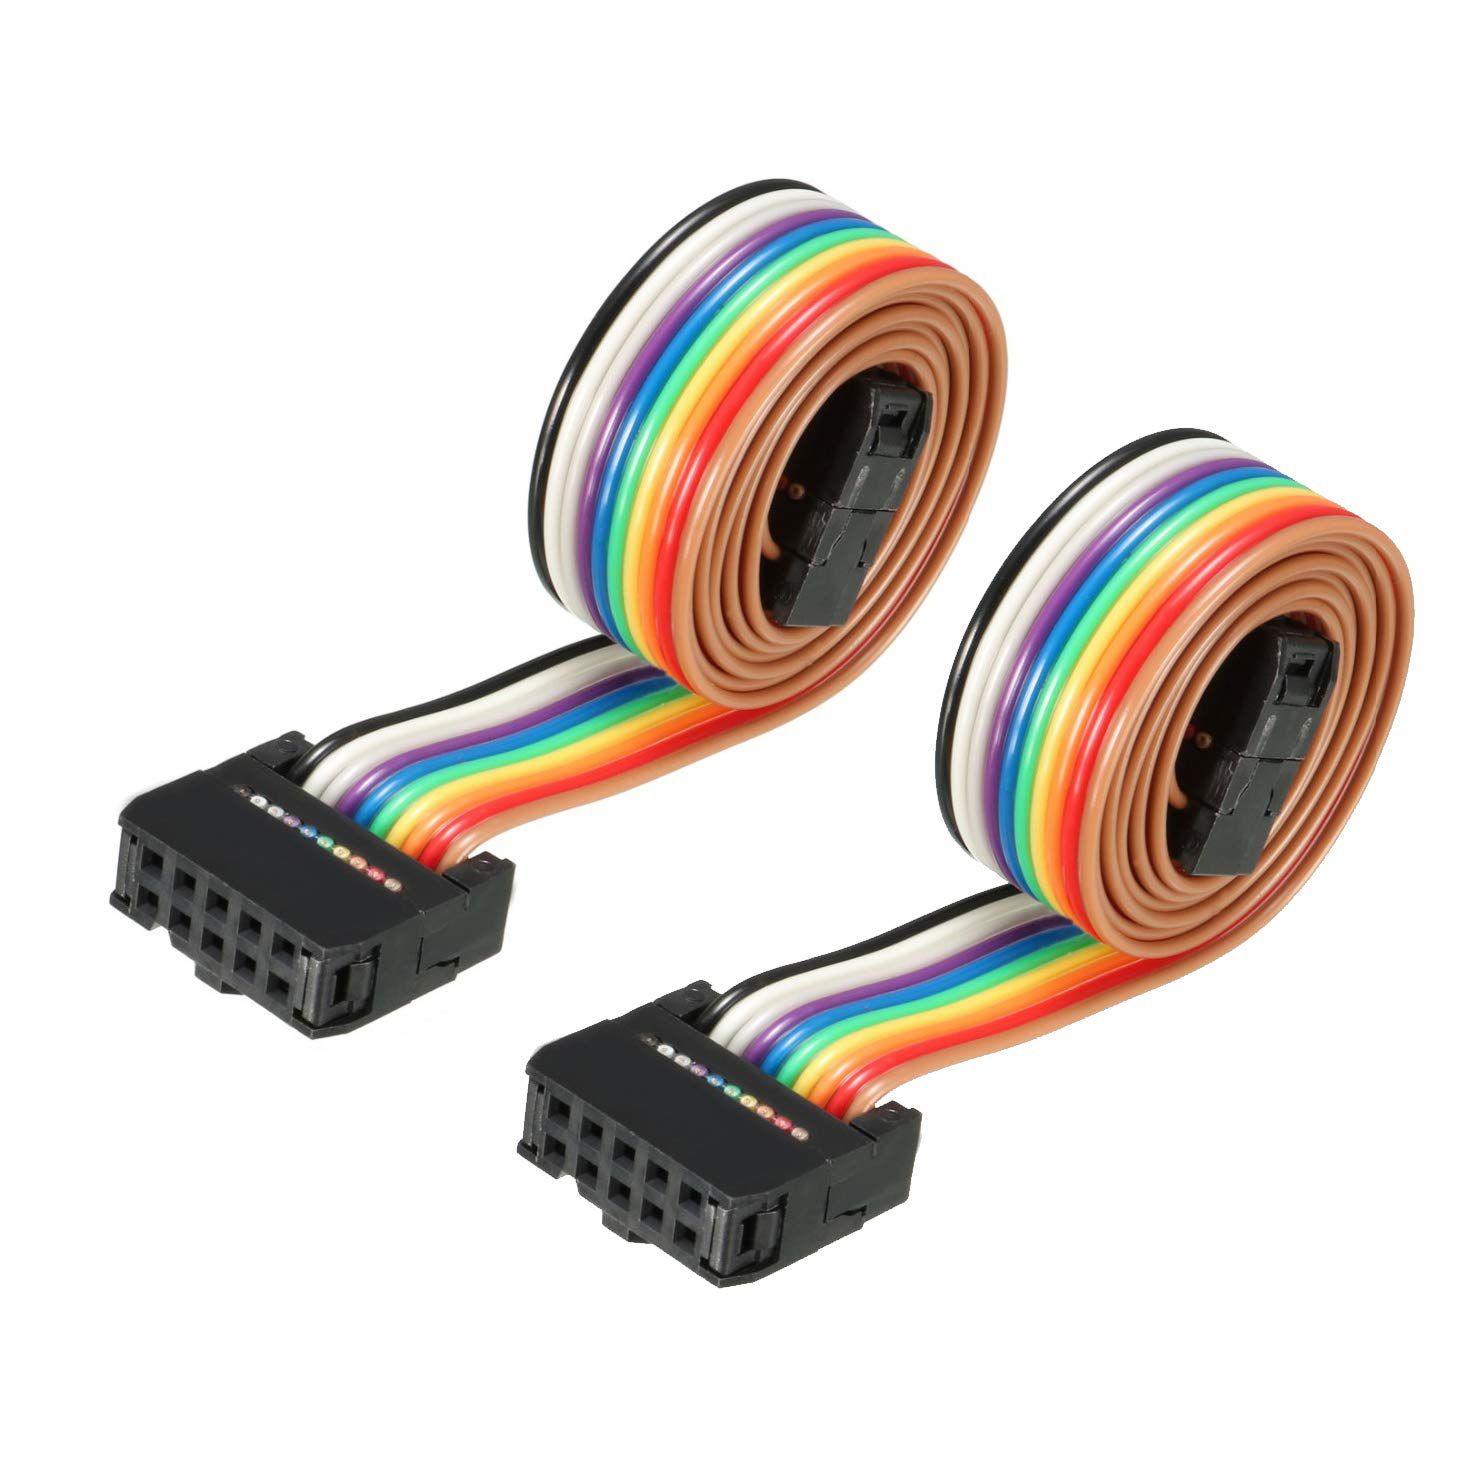 Creality Ender 3/pro/v2 3d yazıcı ekran kablosu - Nmosphere   Manisa 3D  Printer 3D Yazıcı